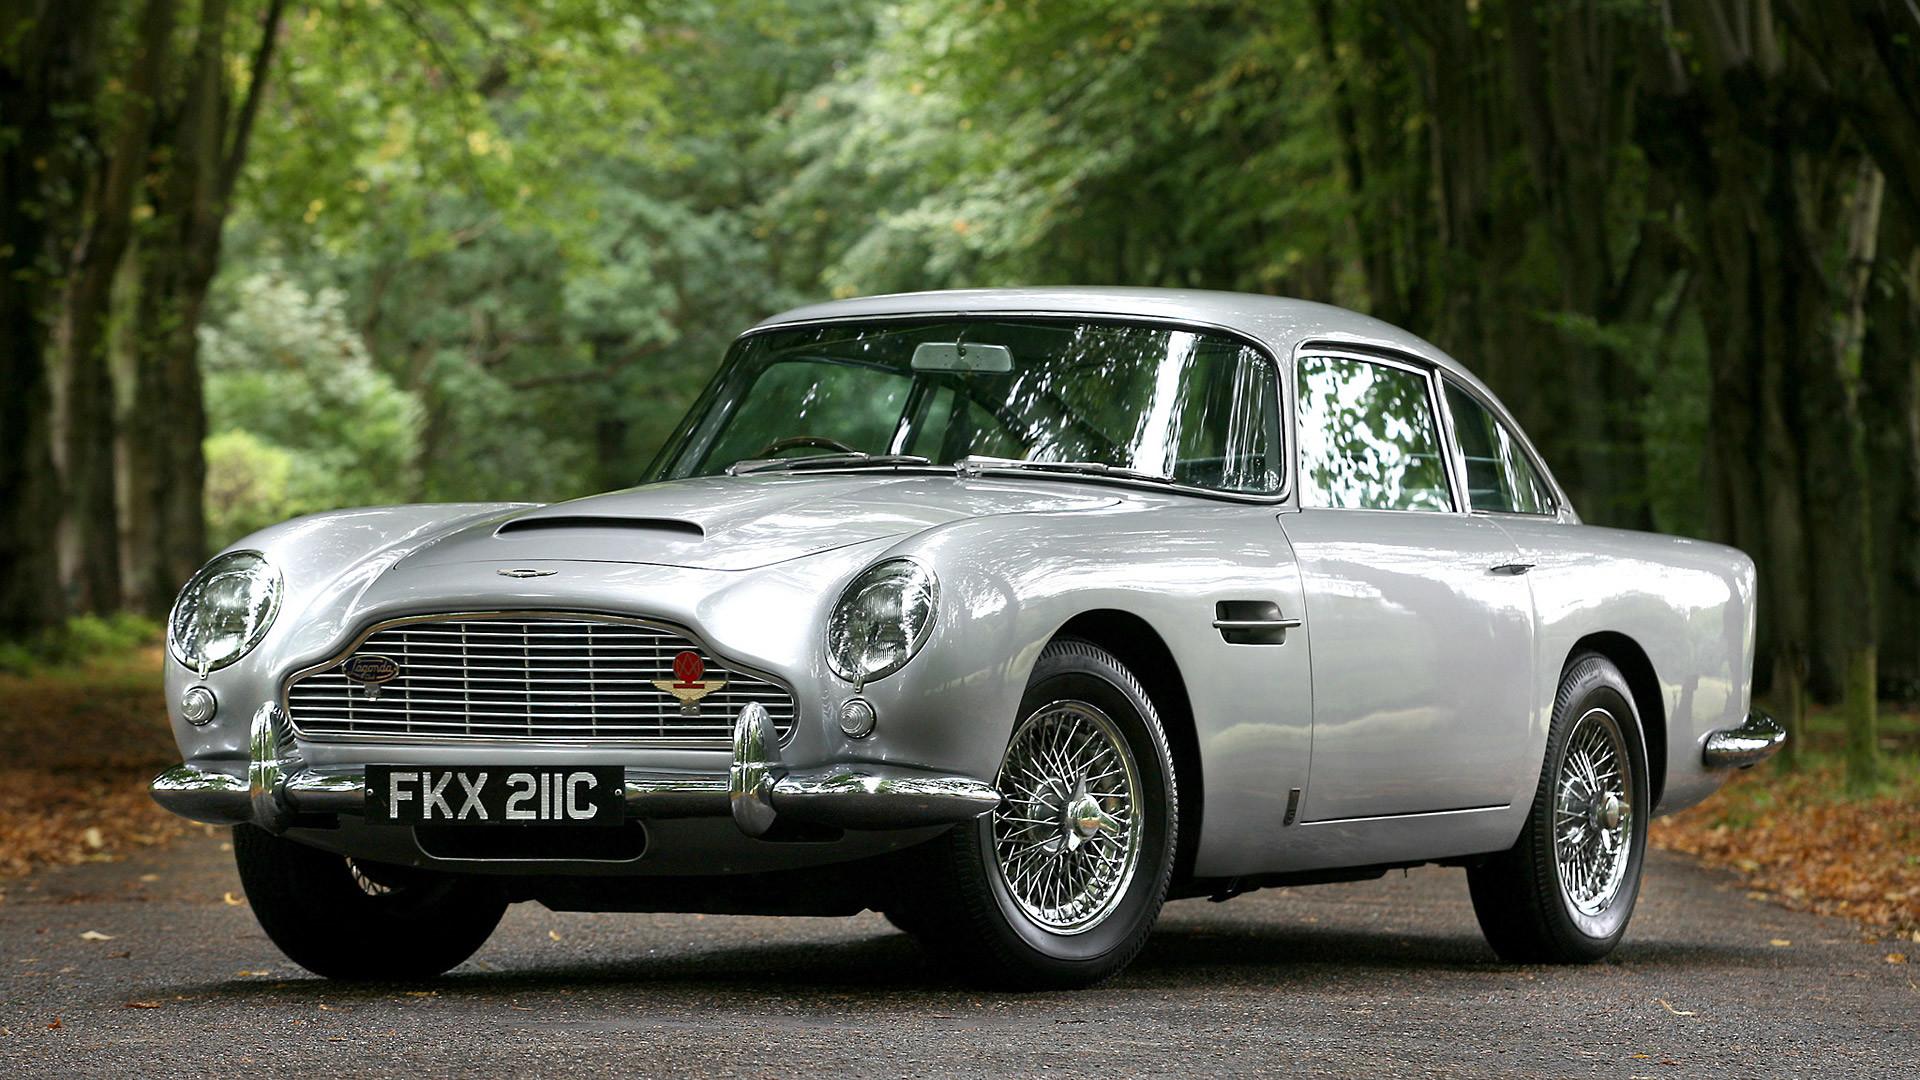 Aston Martin Db5 Wallpaper 74 Images